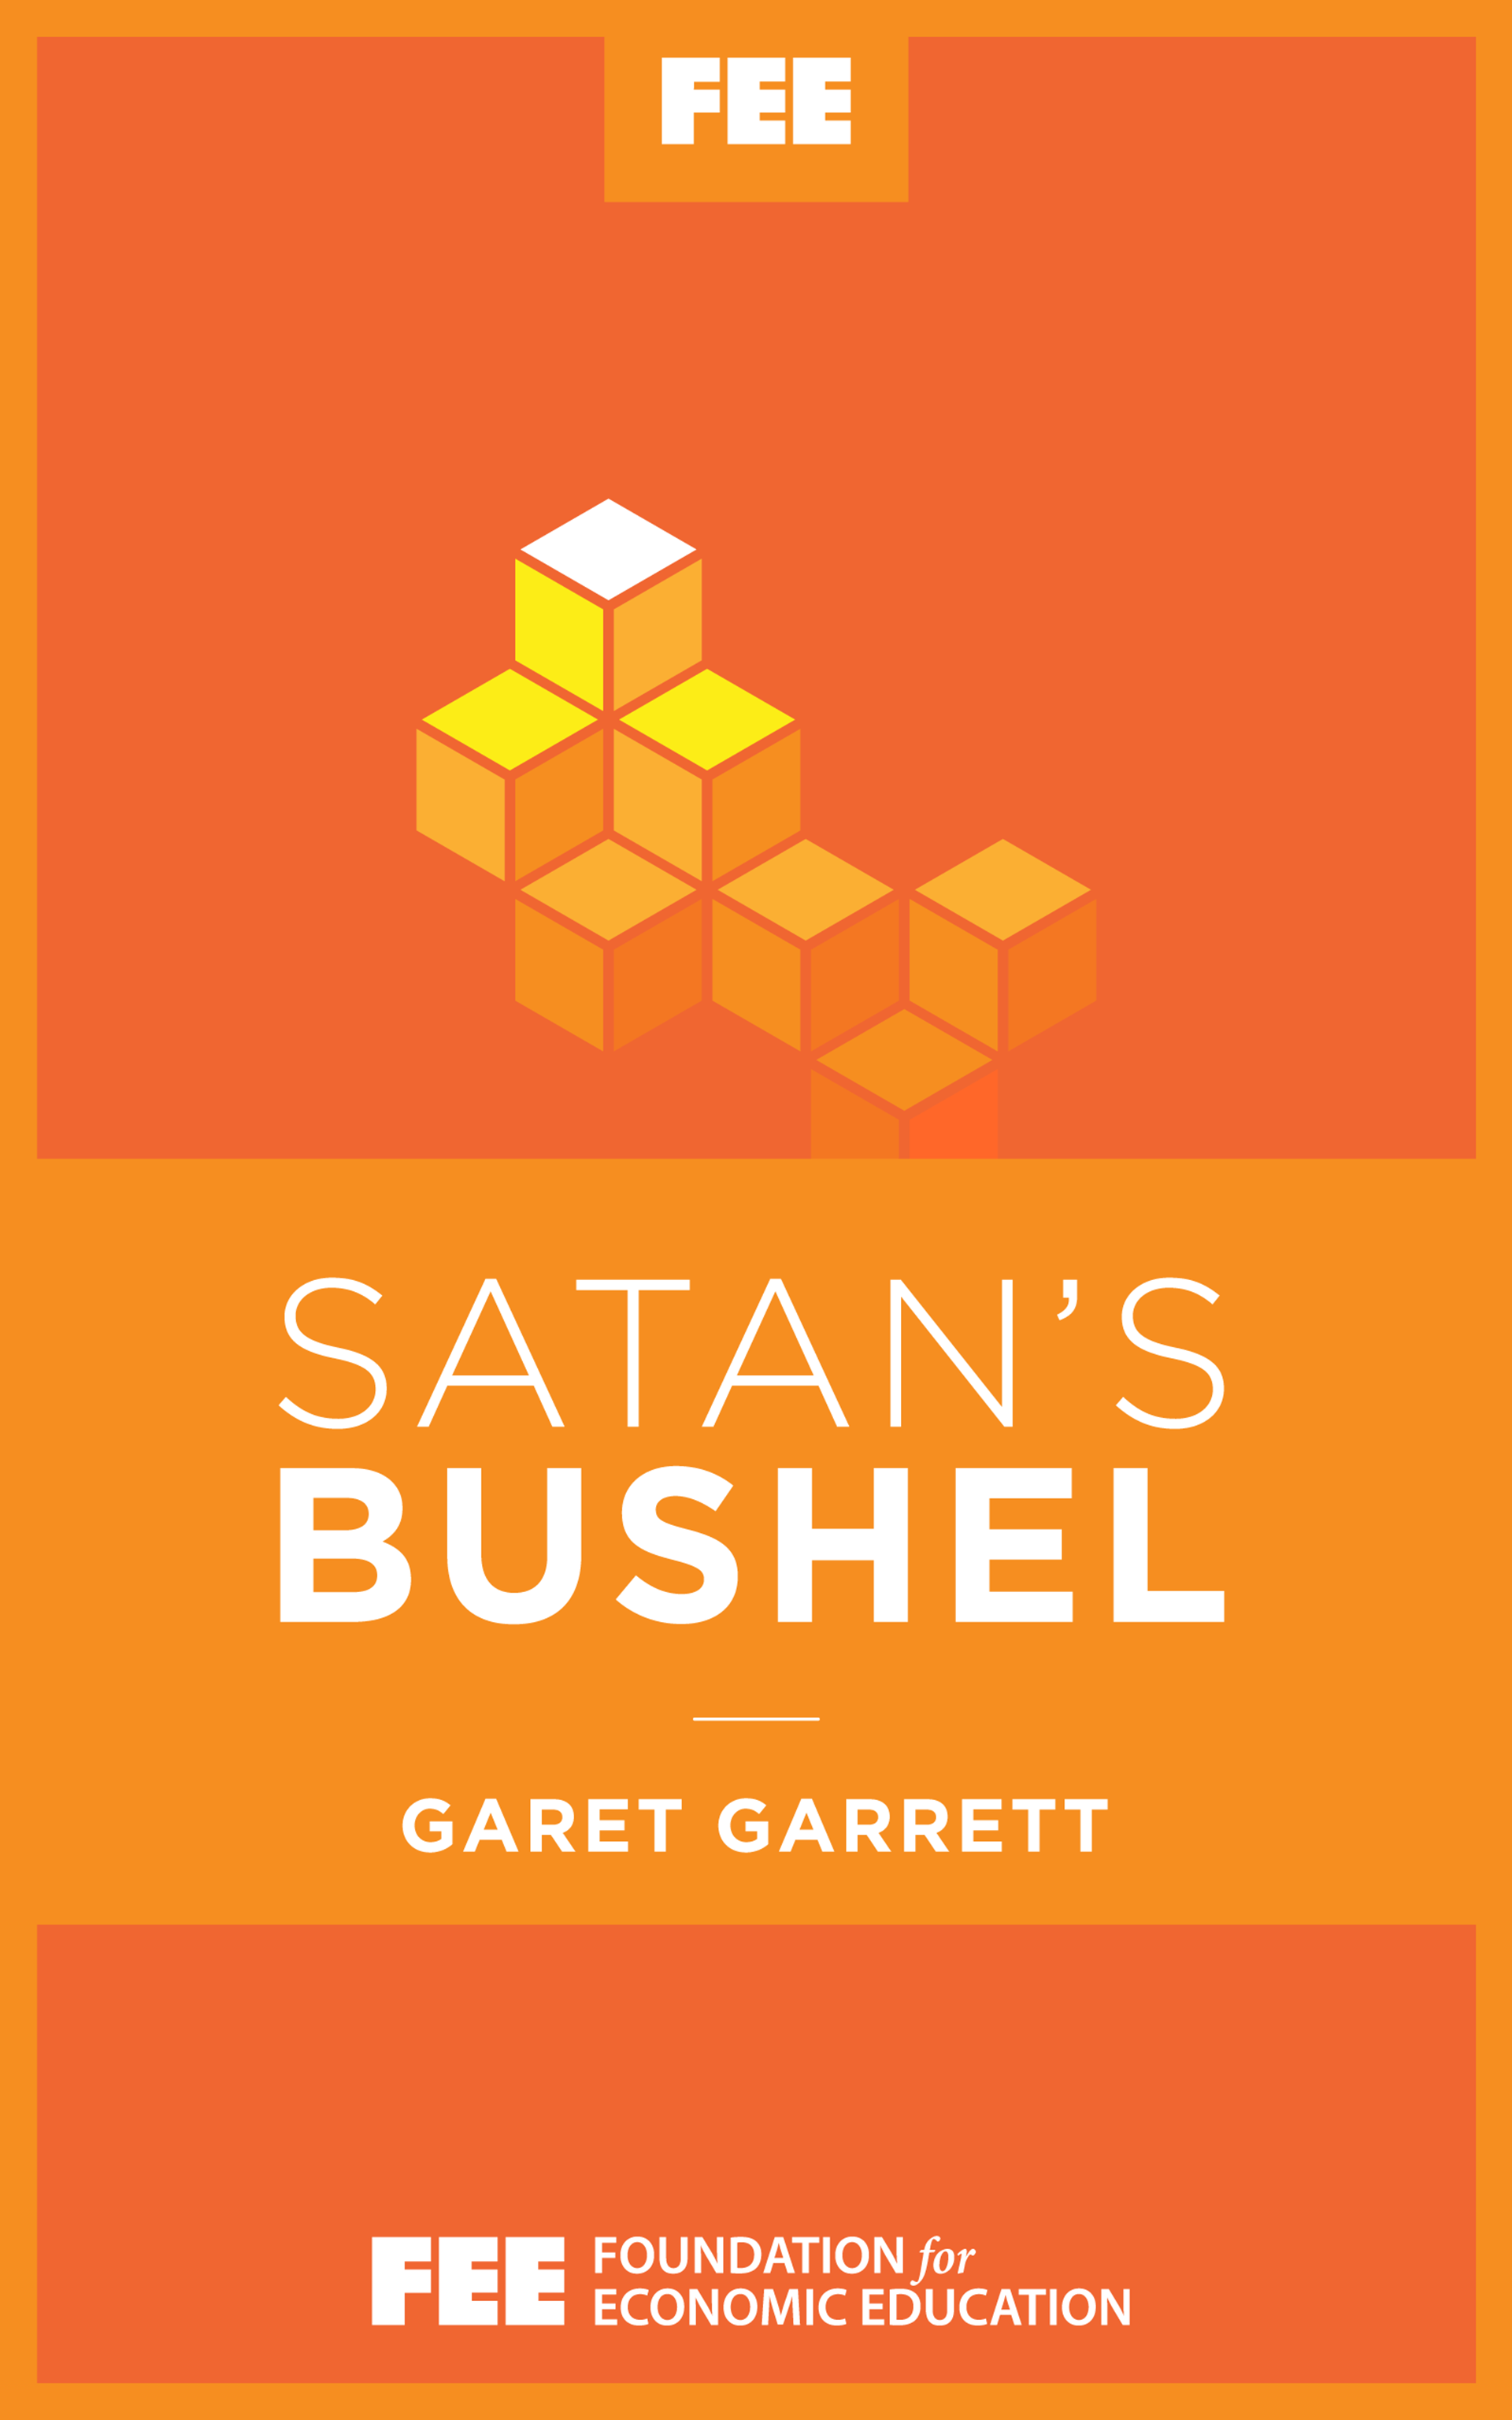 Satan's Bushel - Foundation for Economic Education